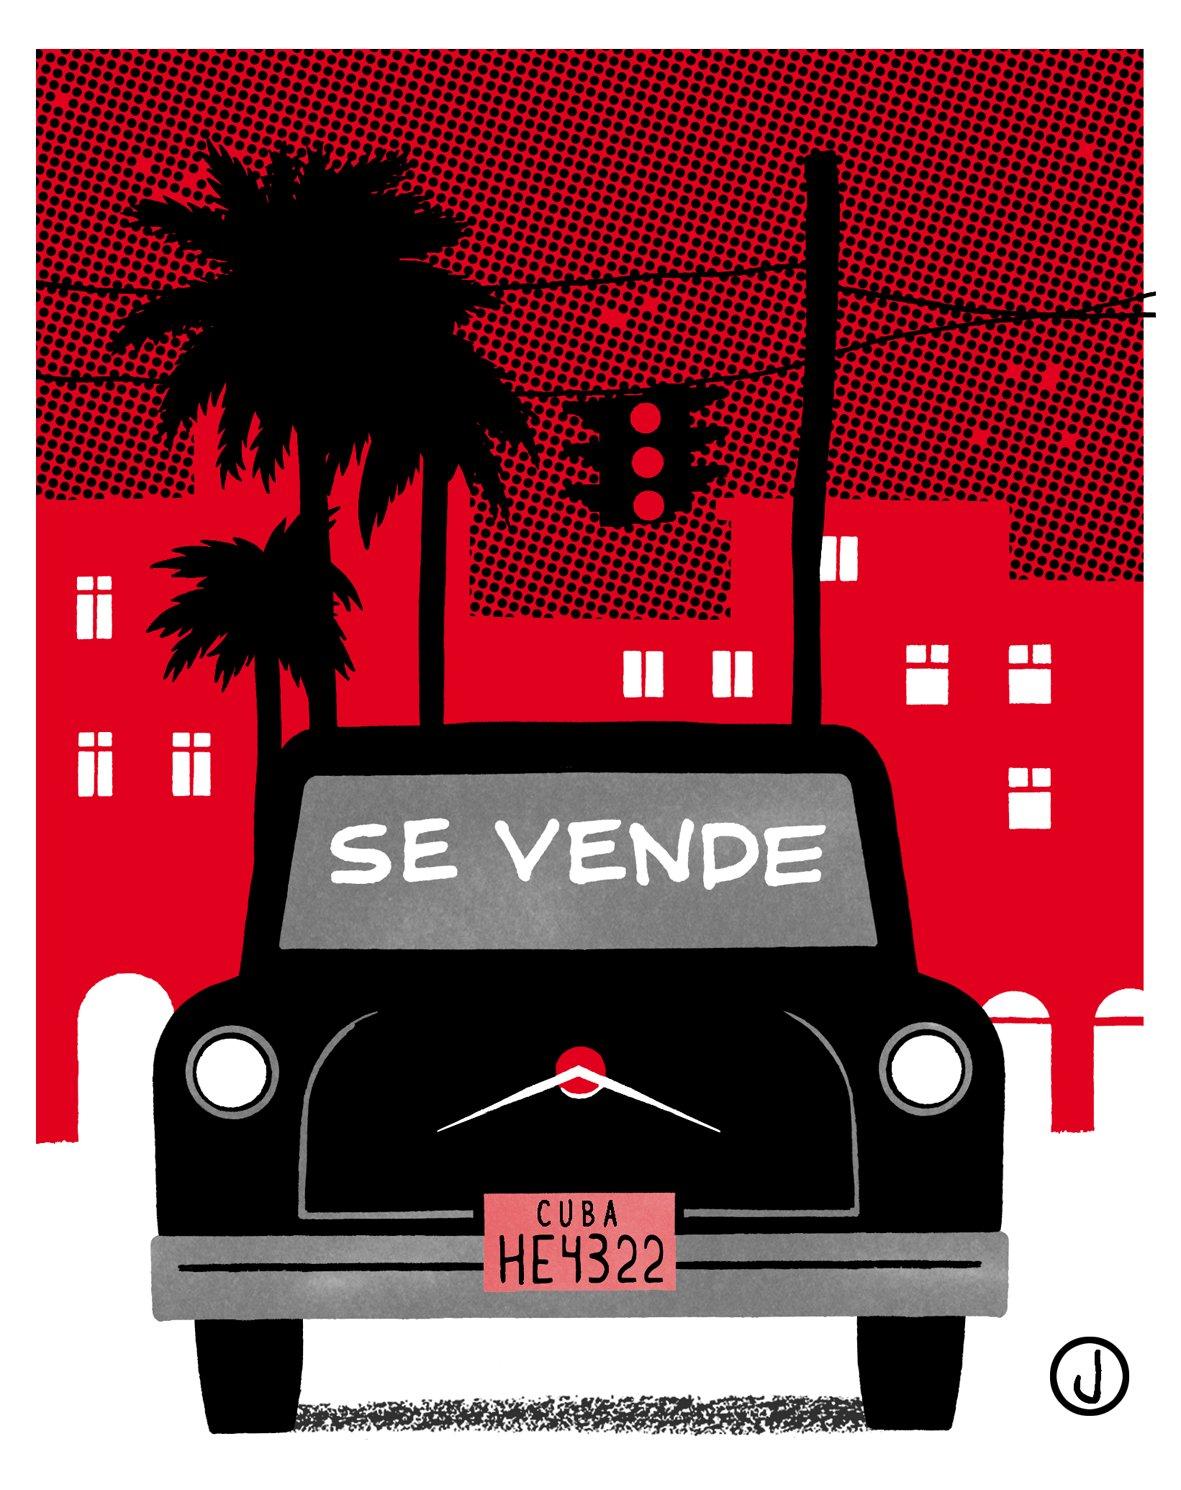 """Hace unos días he conseguido por fin un carrito cubano para alquilar unos meses"". Ilustración de Jano"